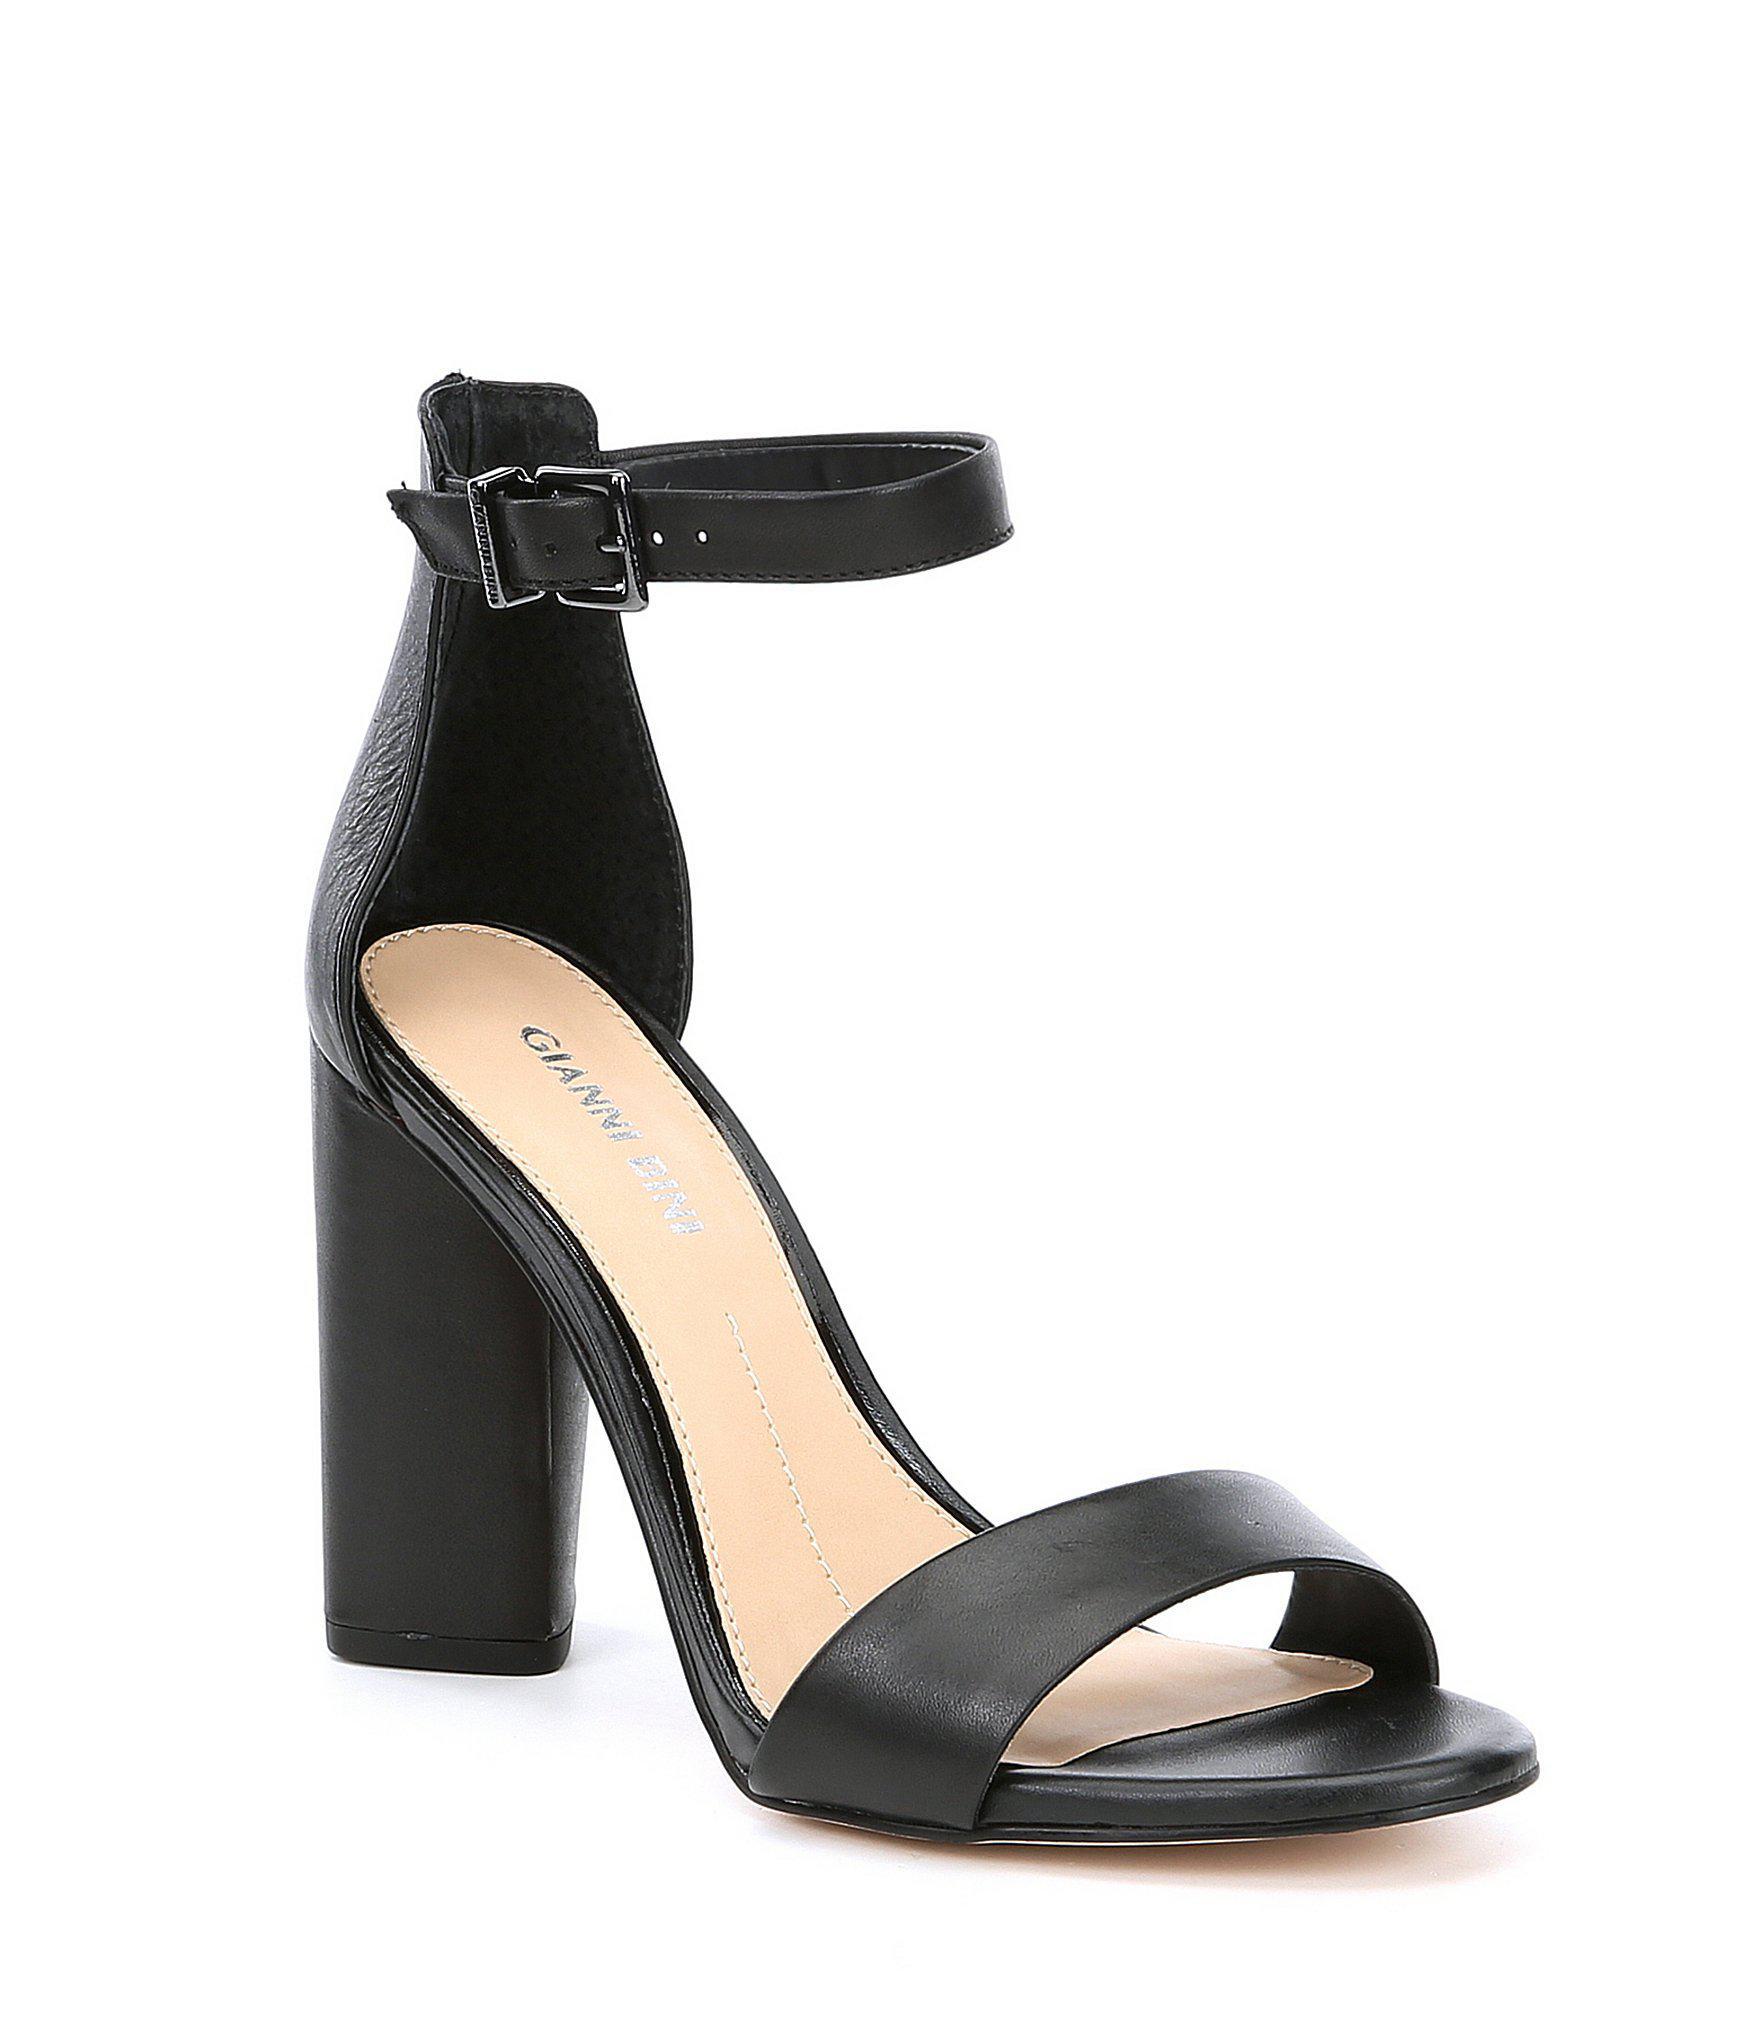 60032d1e0b94 Gianni Bini. Women s Black Joenah Two Piece Ankle Strap Block Heel Dress  Sandals